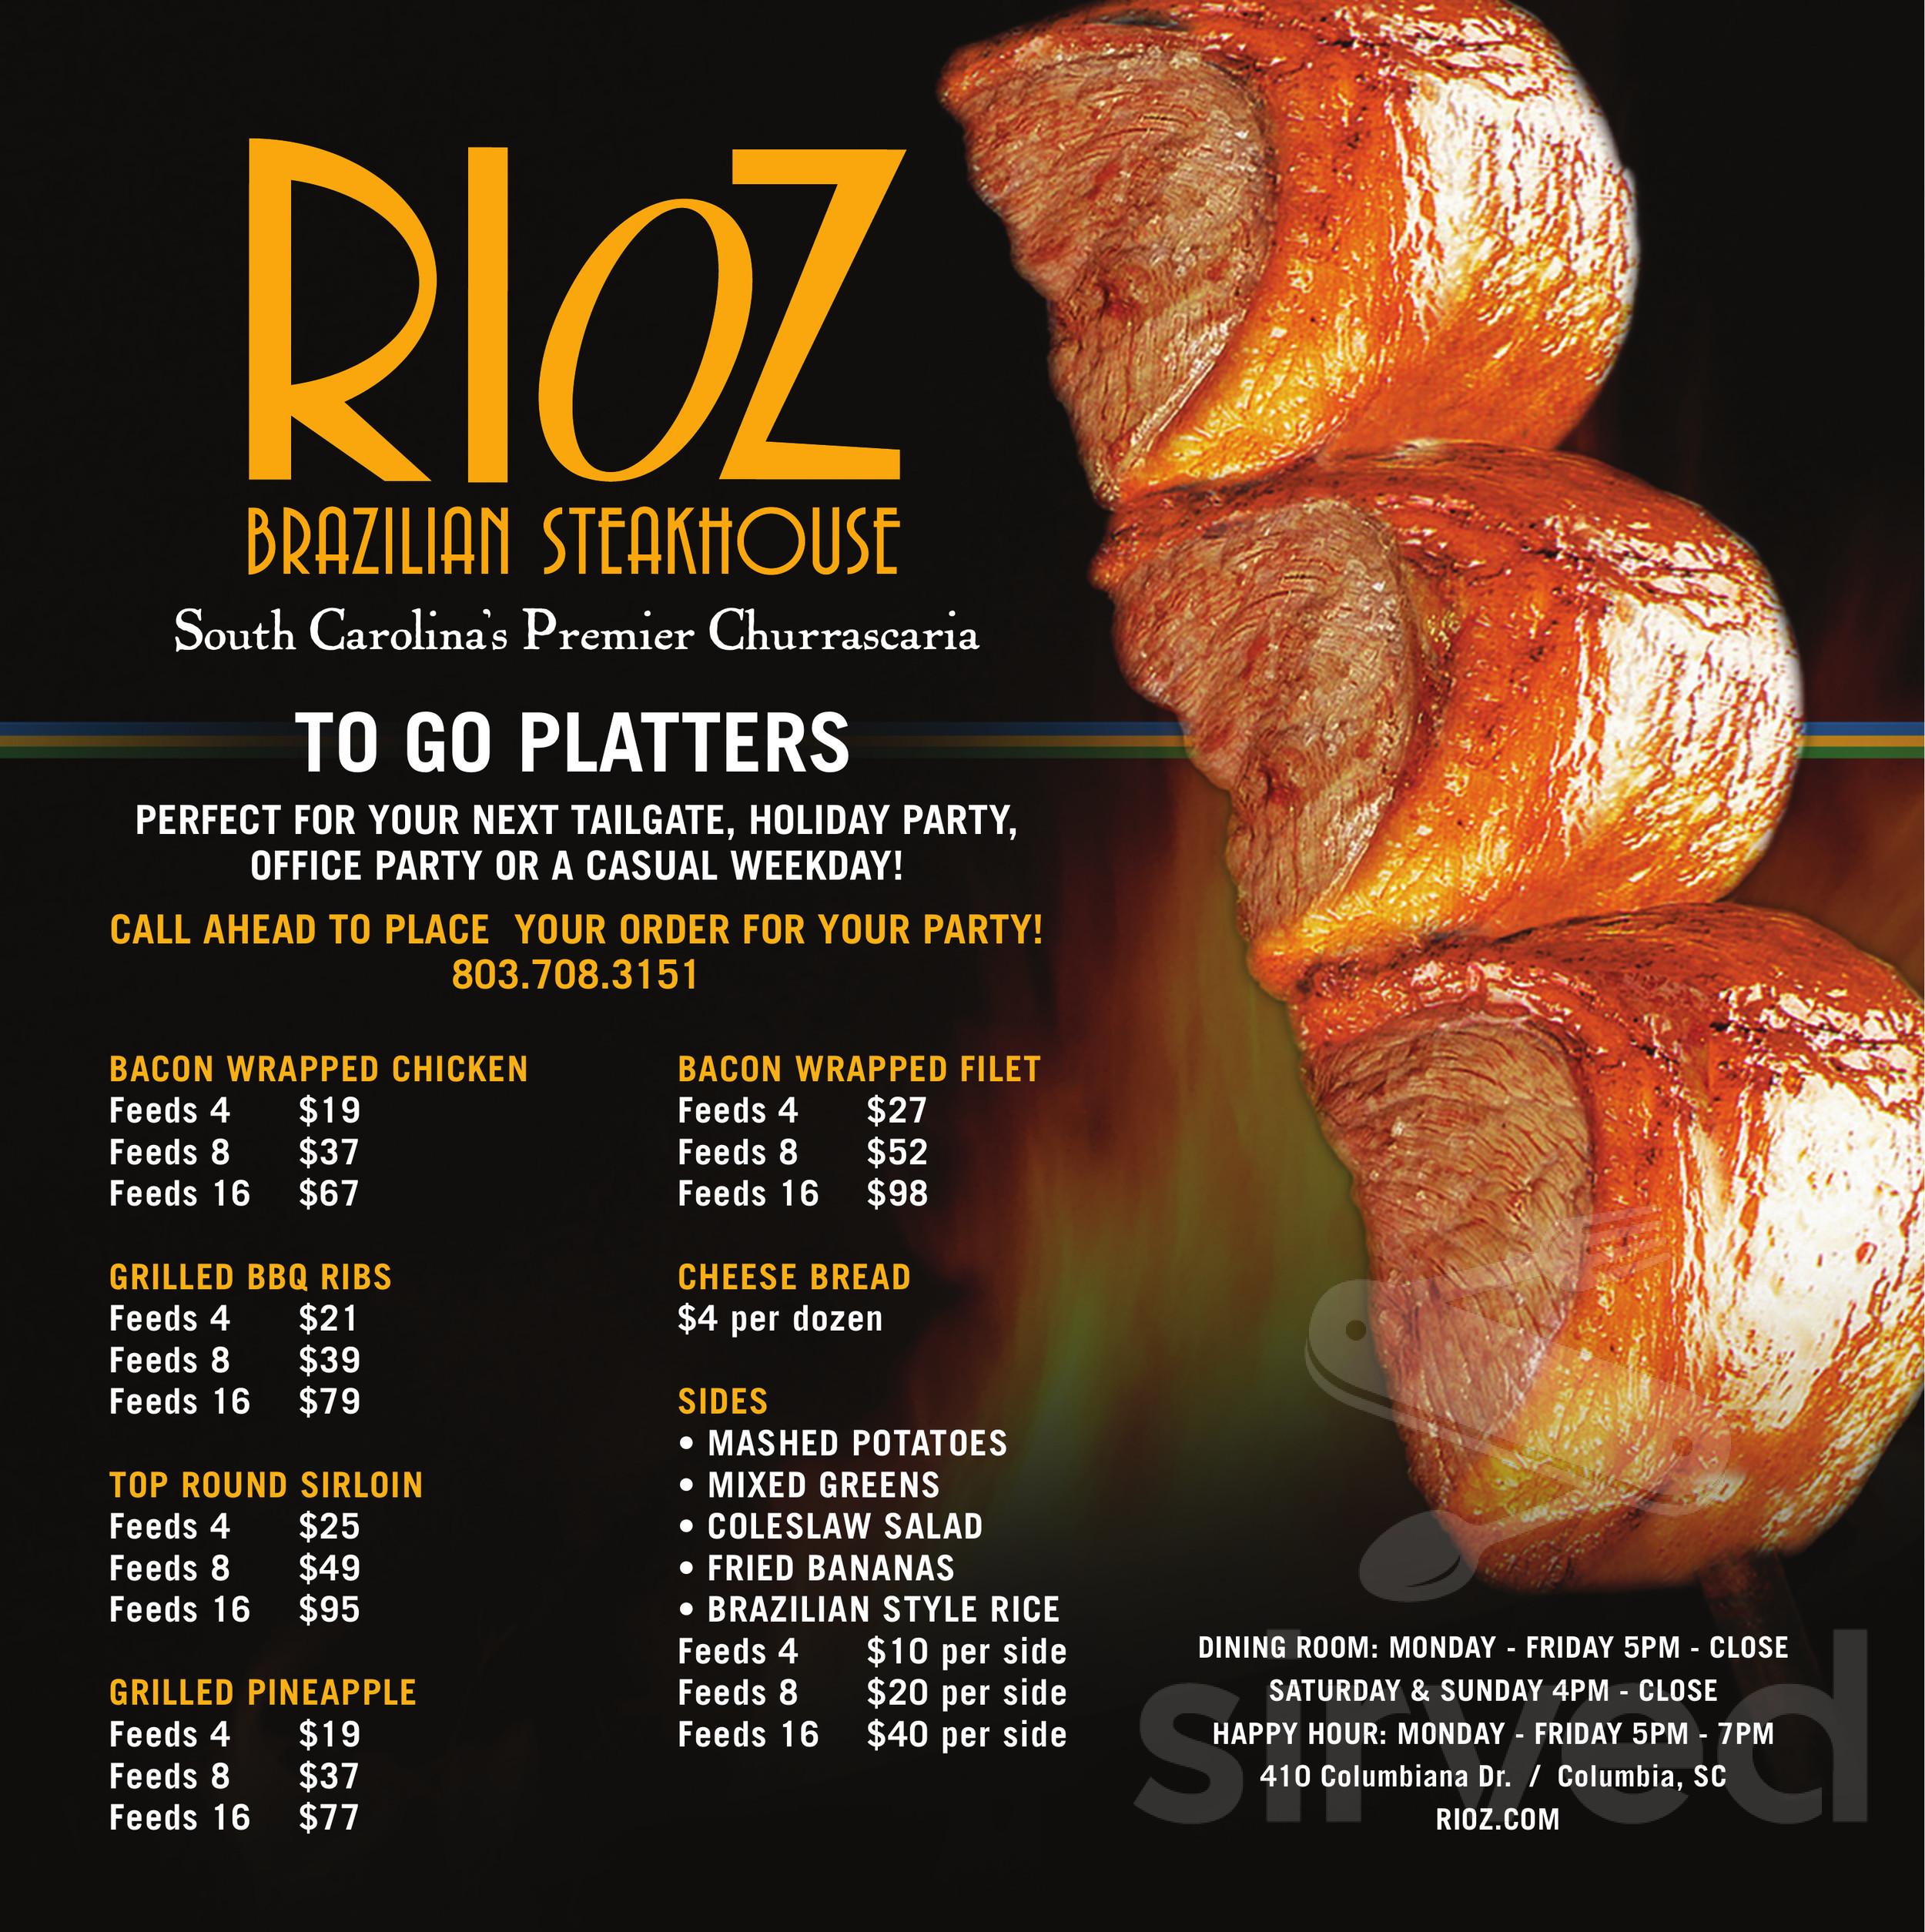 Rio Brazilian Steakhouse